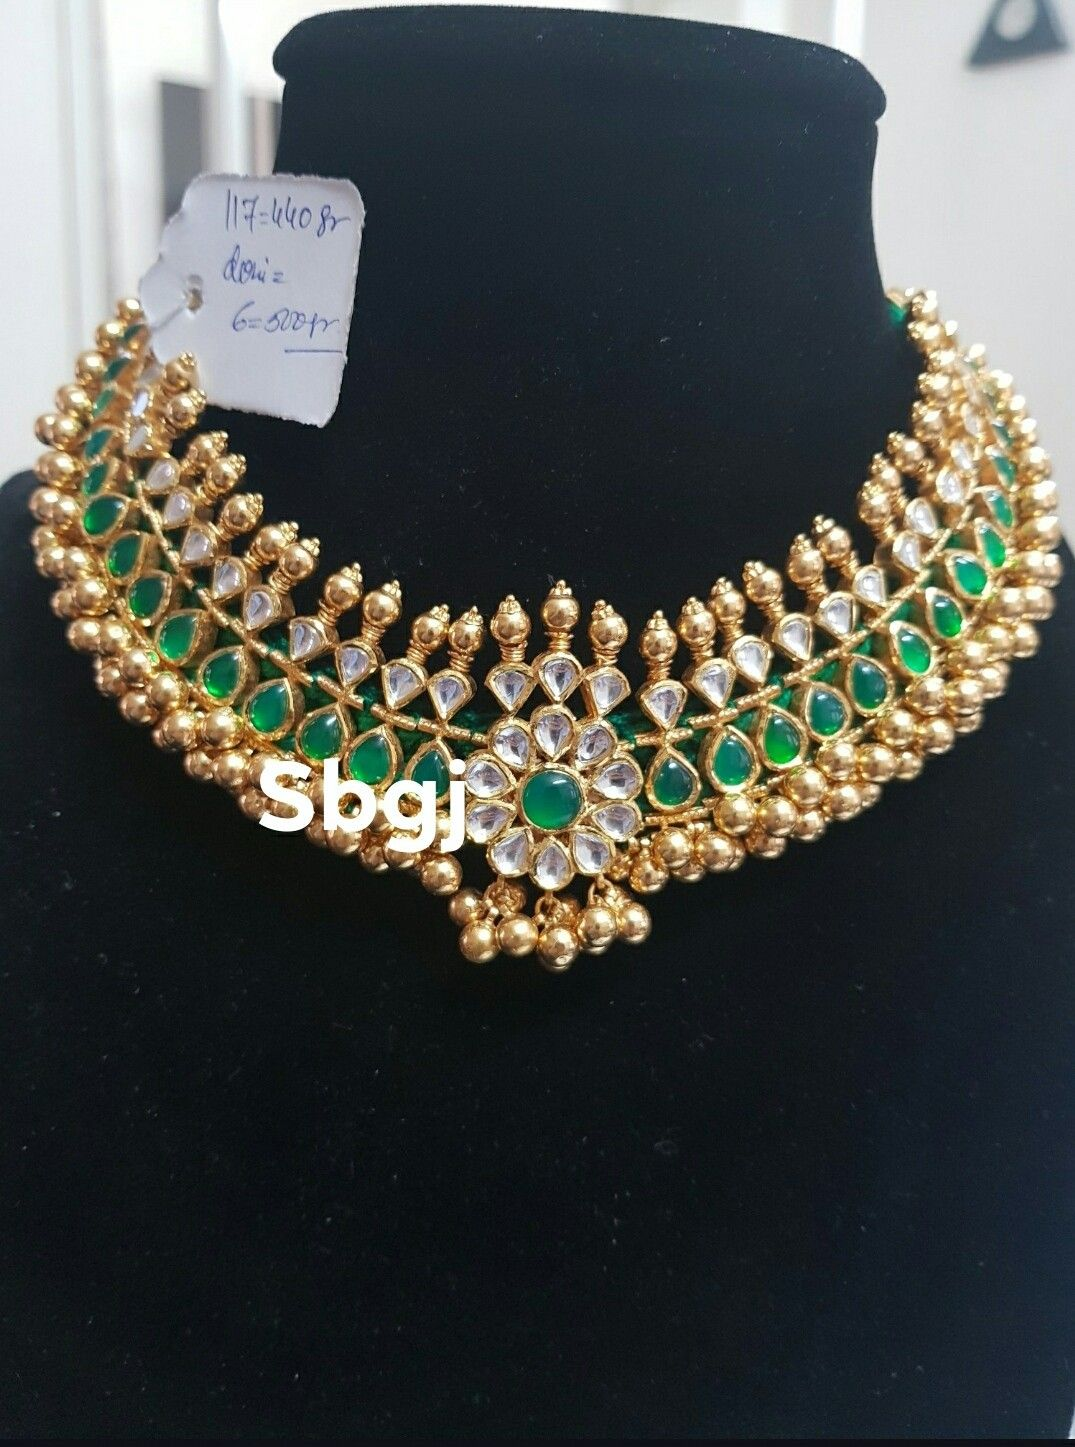 Balaji Jewelers Sea Blue Gold Crystal Fashion Jewelry Chain